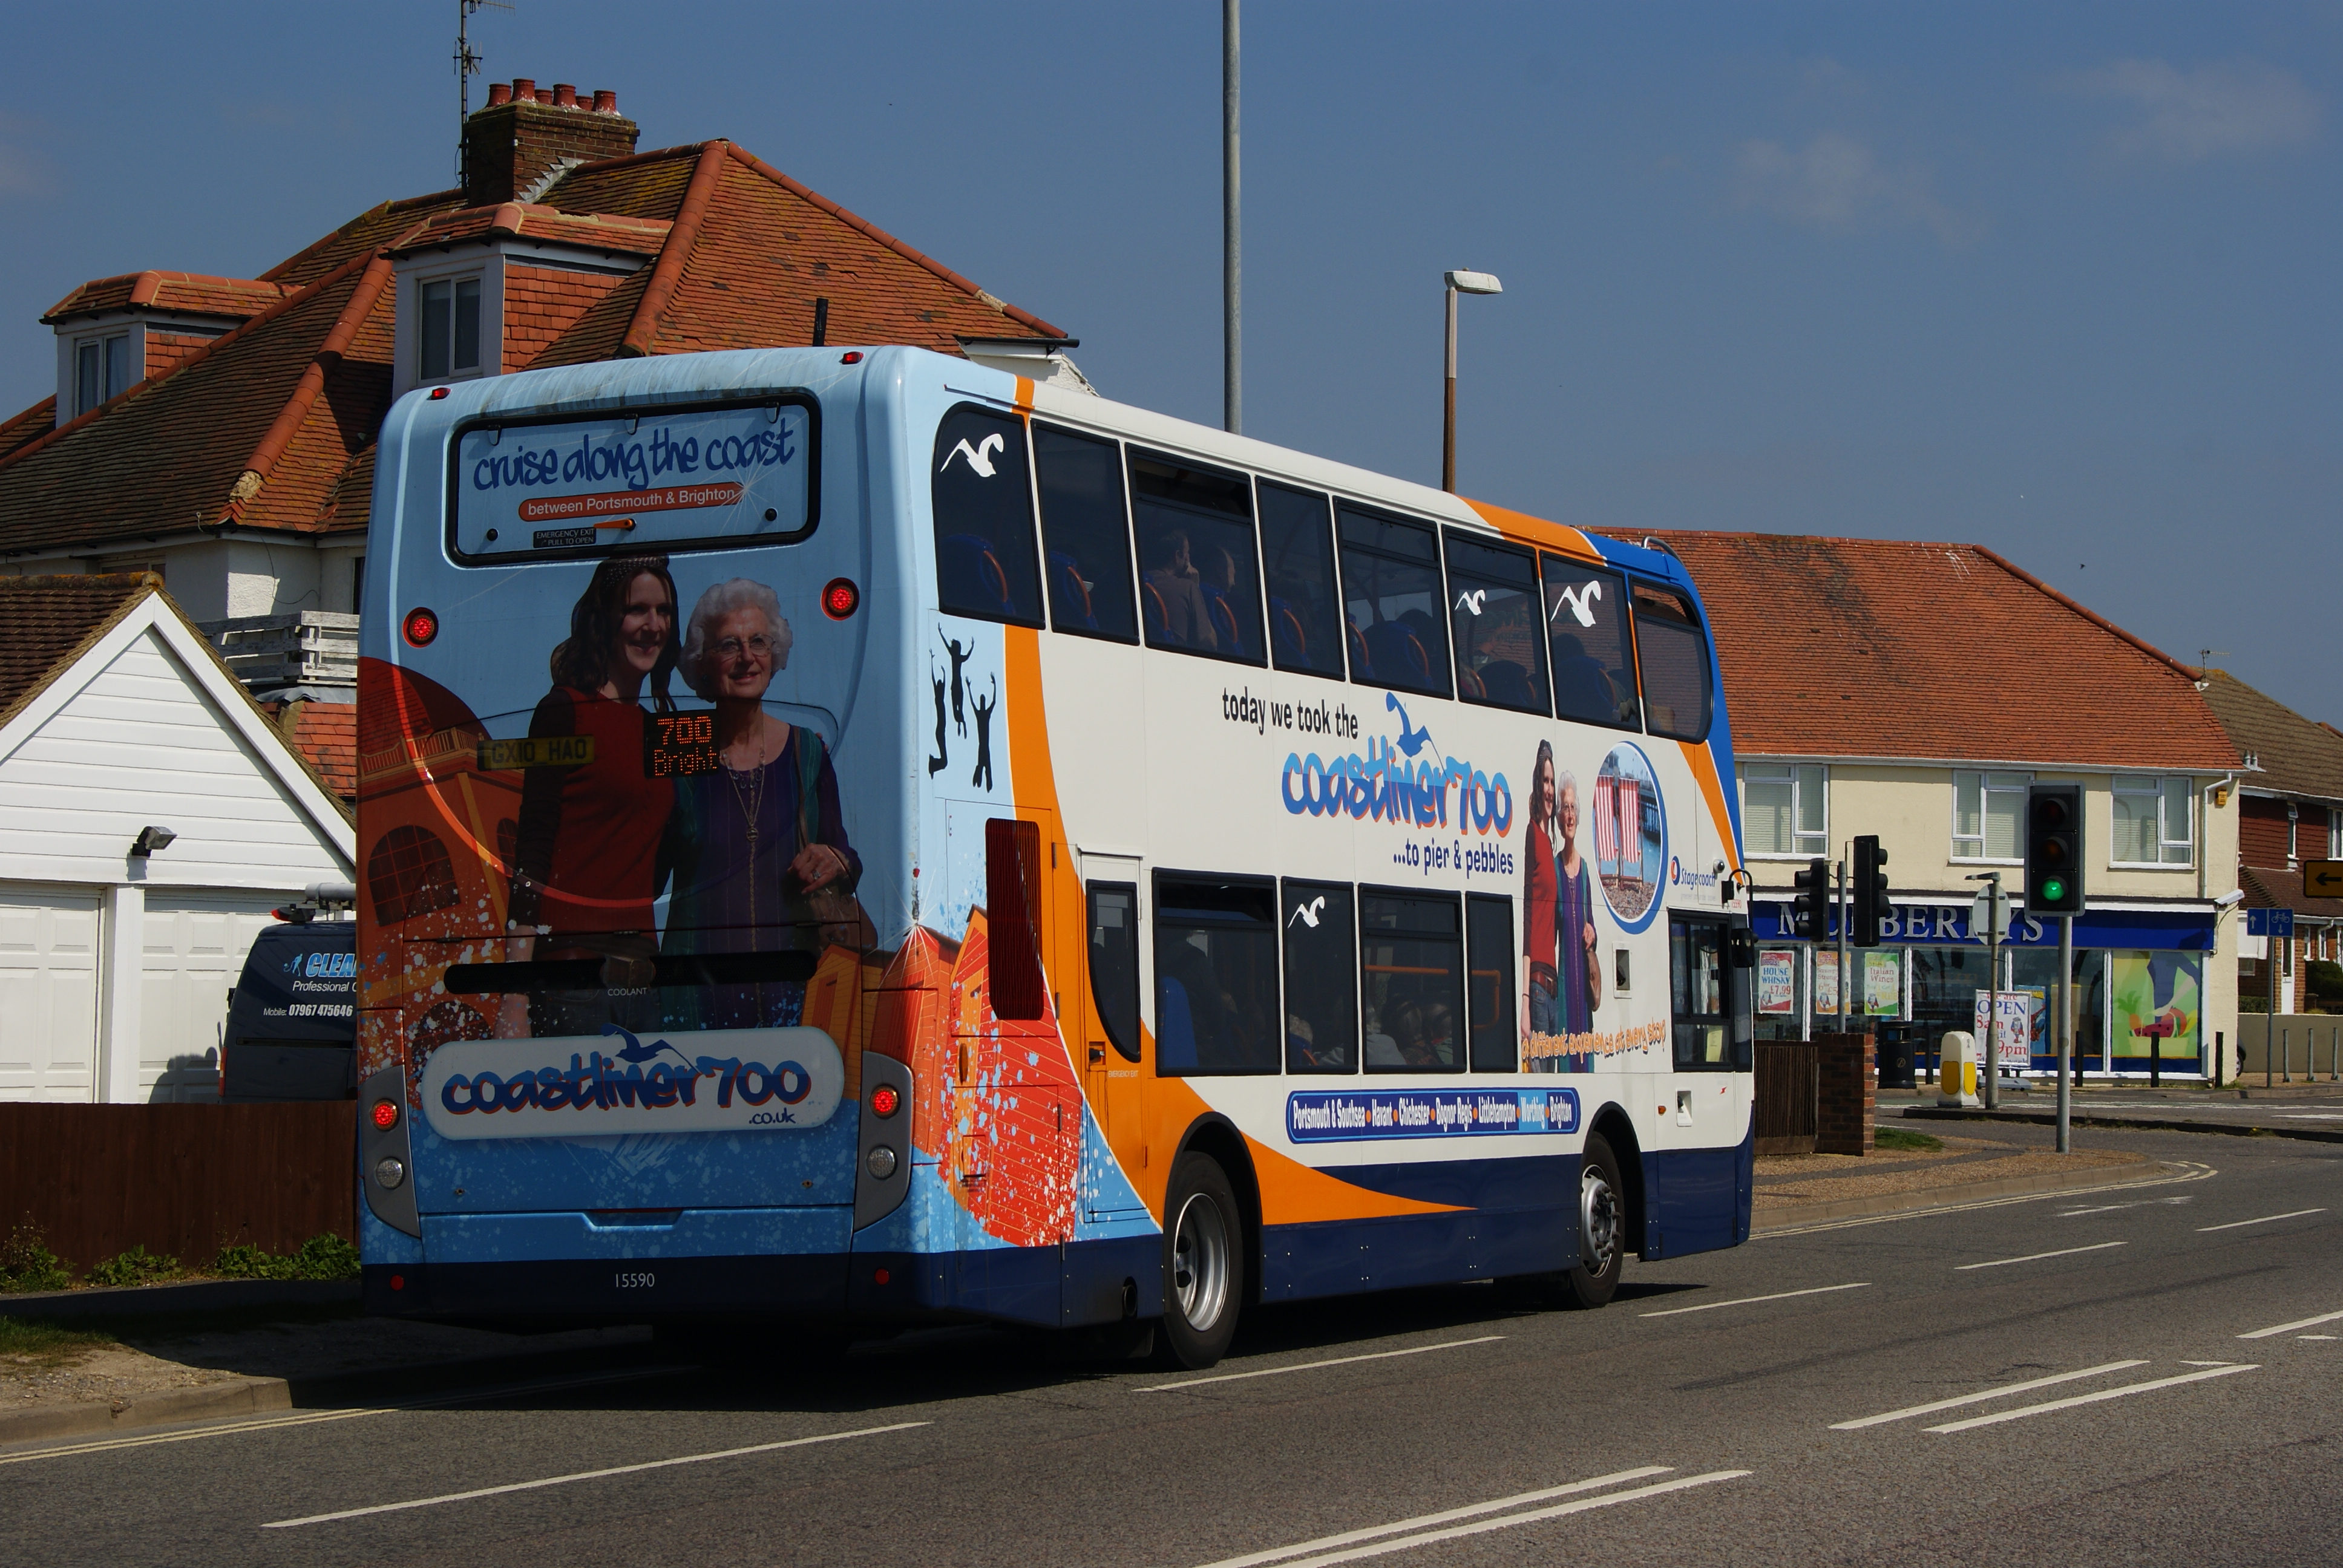 FileCoastliner 700 Southwick Sussex